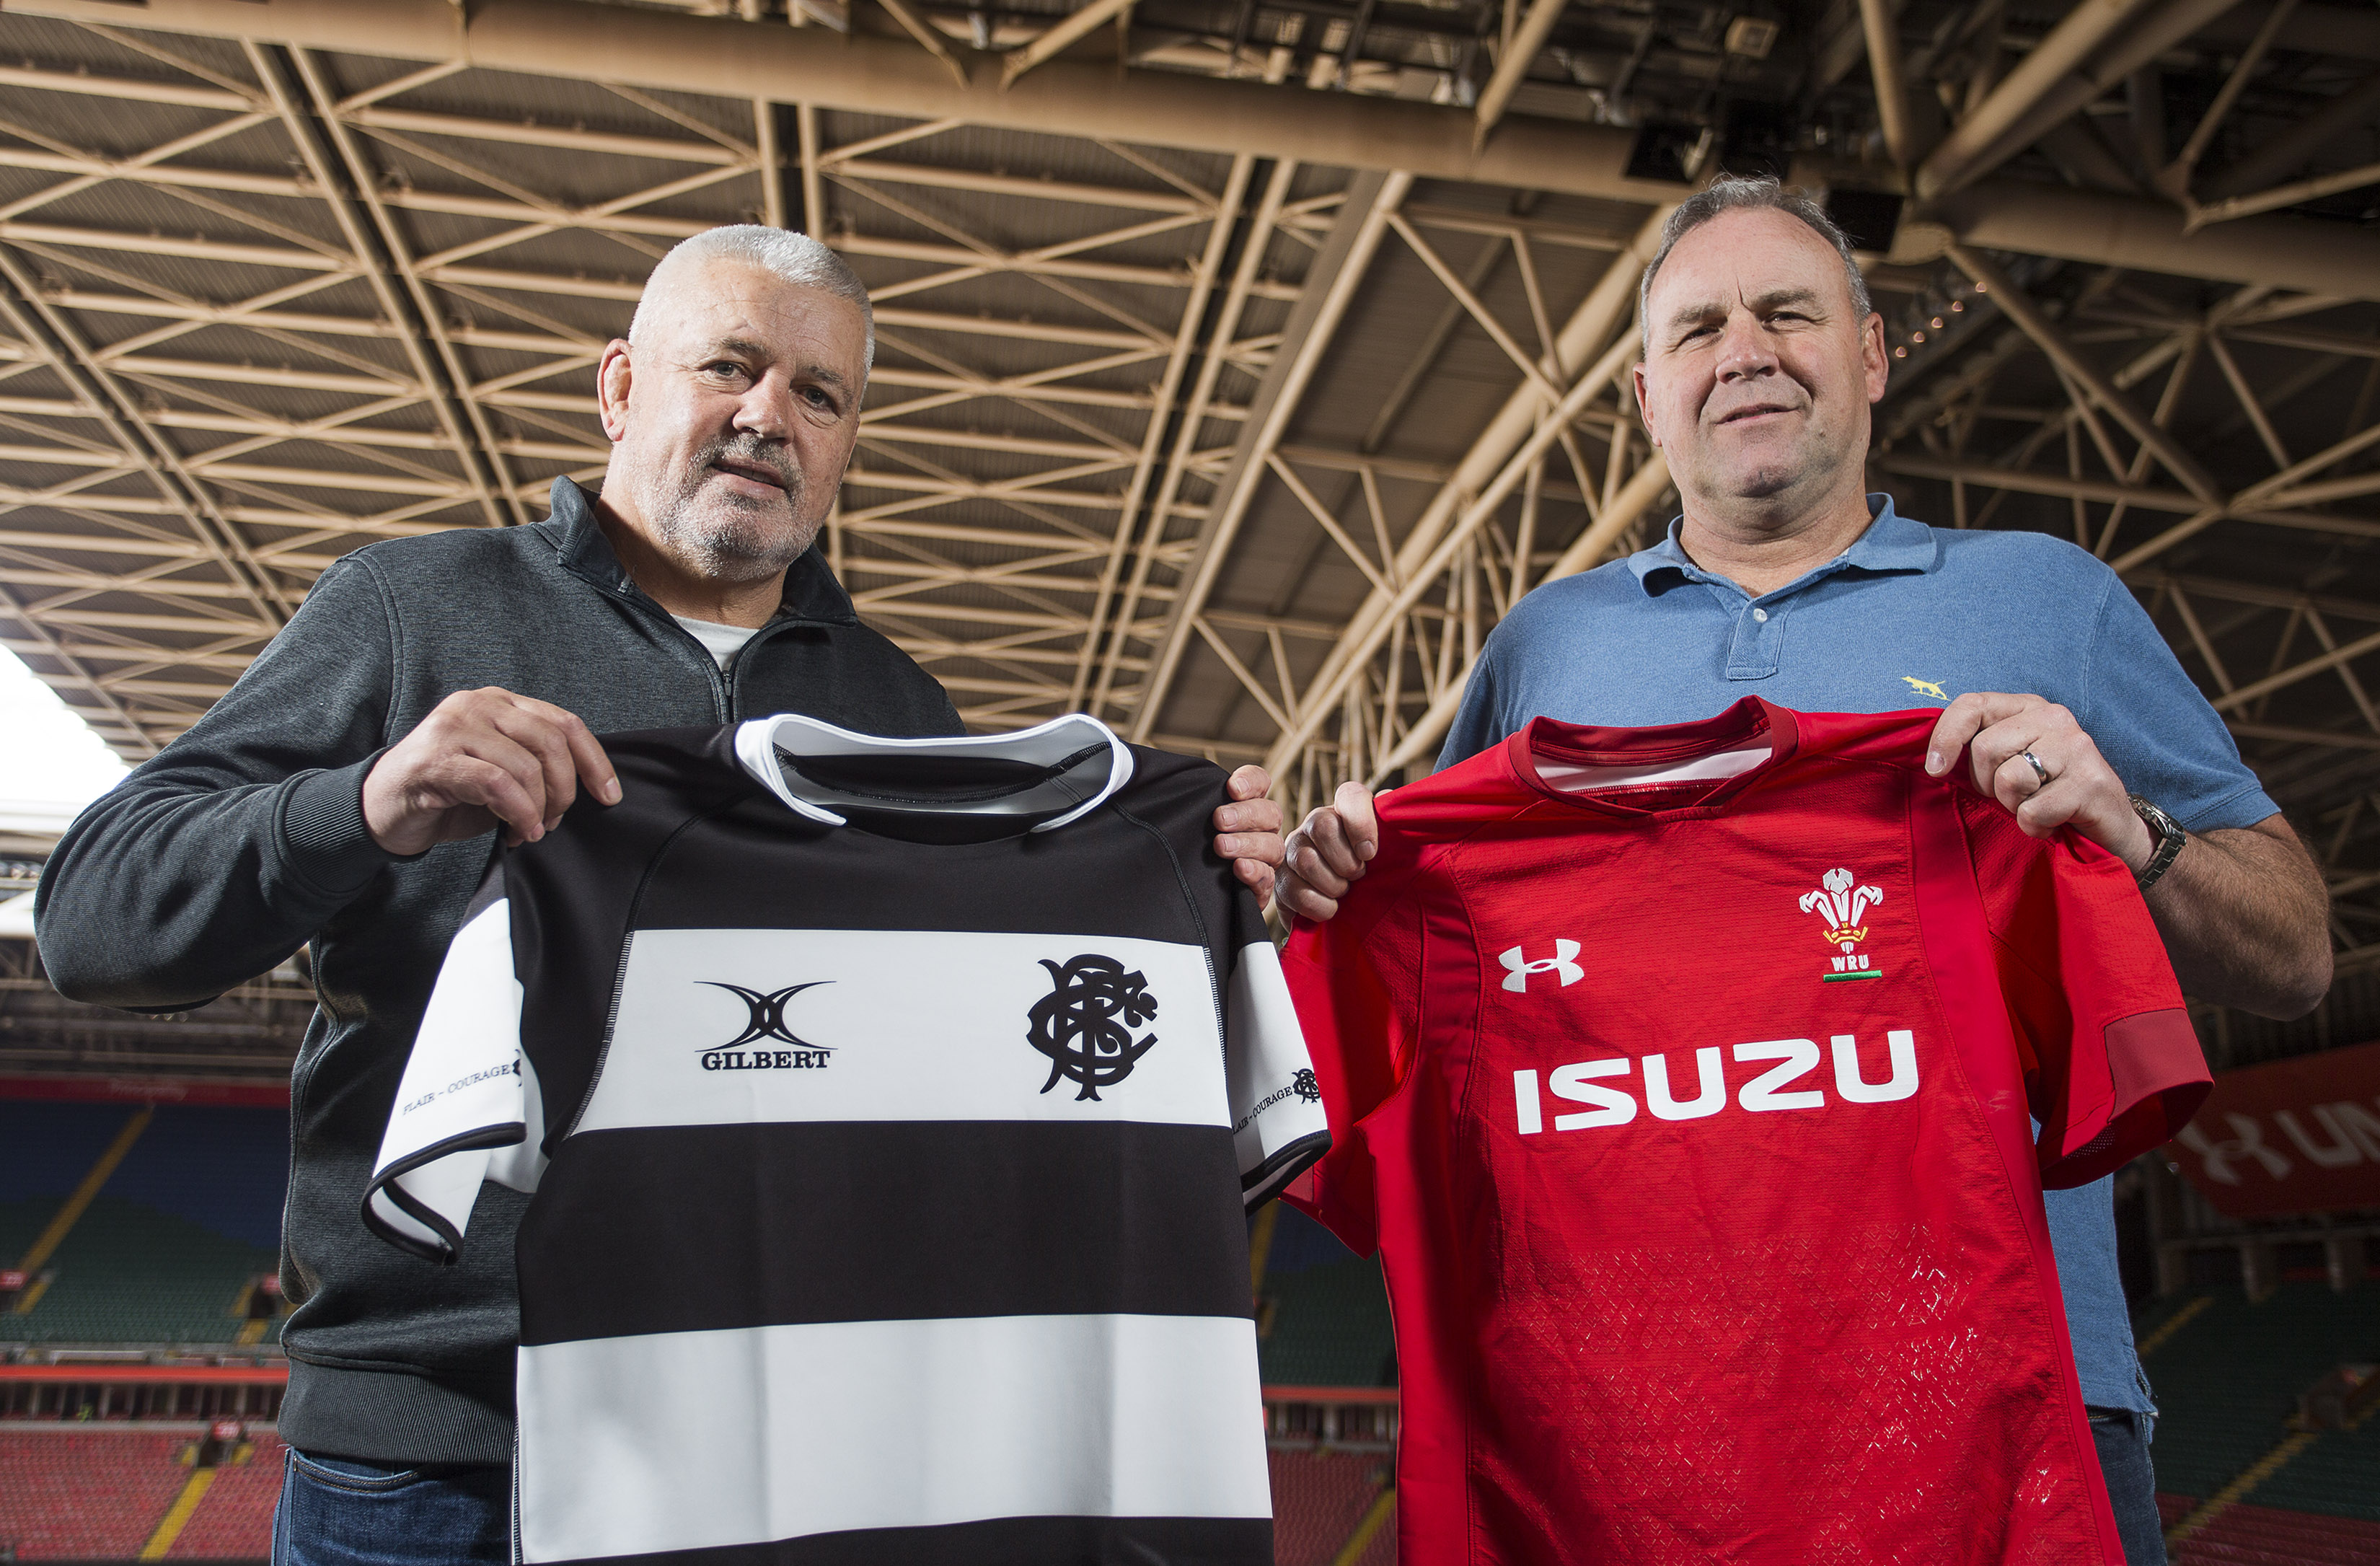 Welsh Rugby Union   Wales & Regions   Baa Baas double header on sale